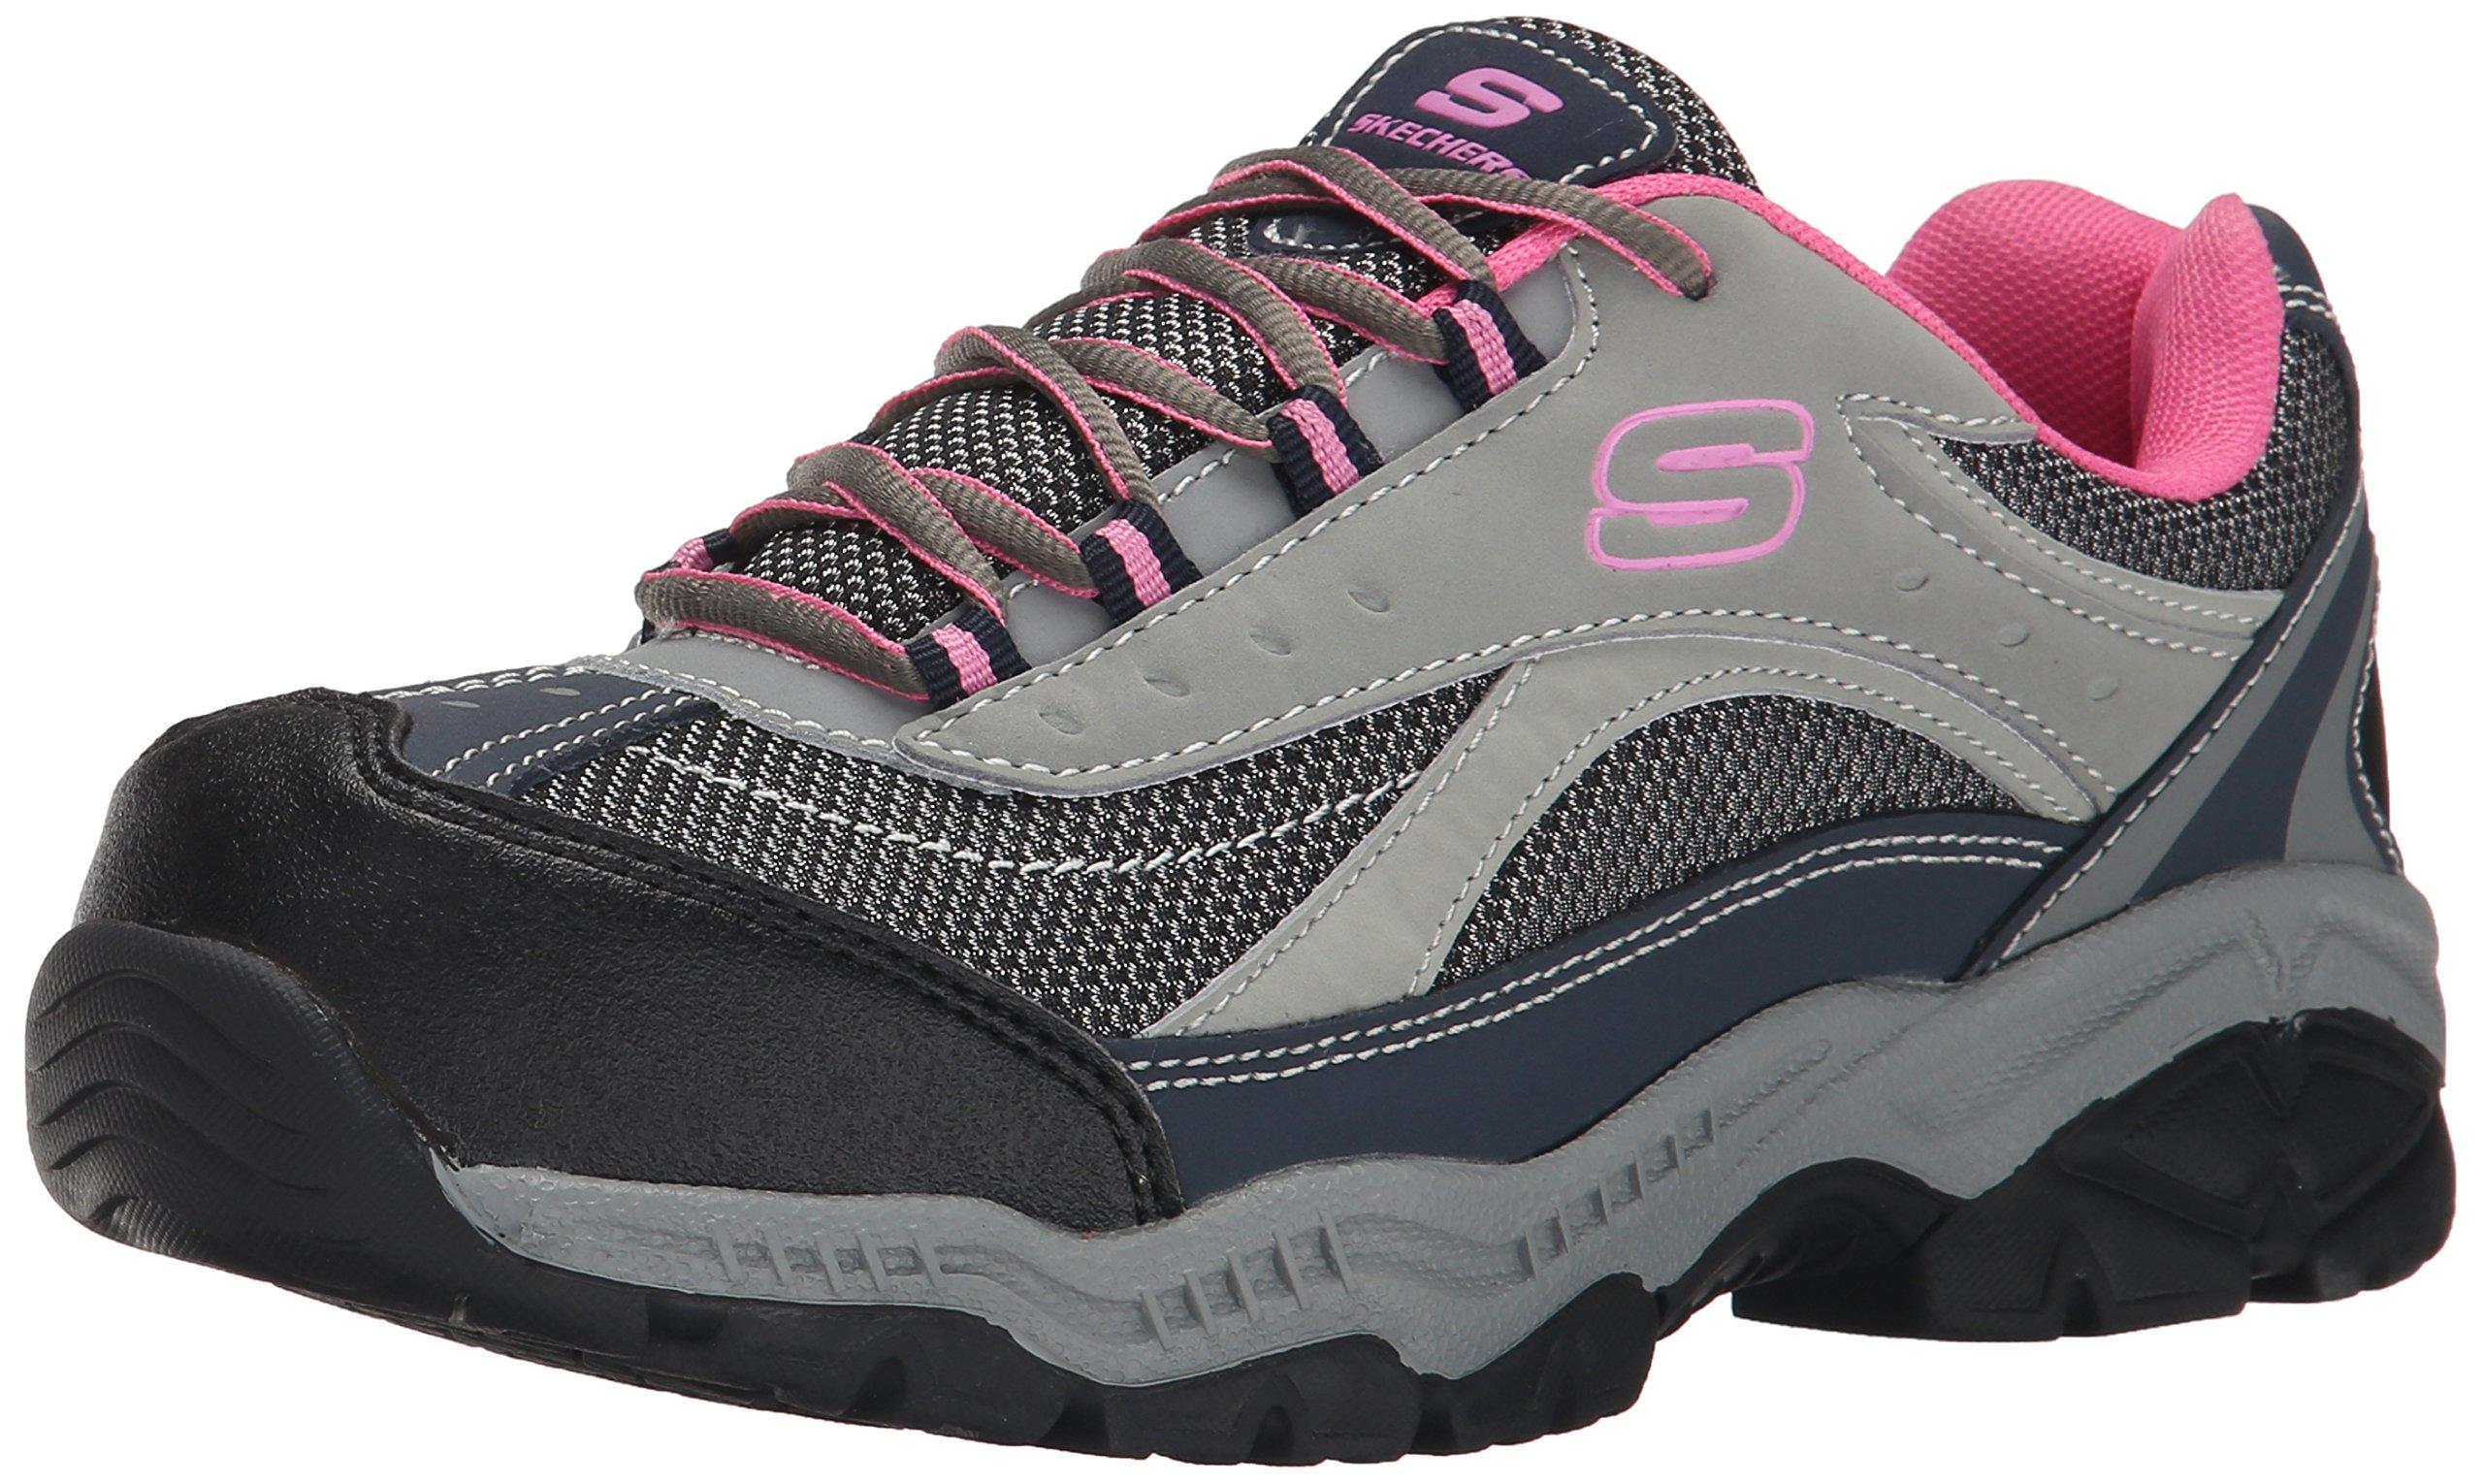 Skechers for Work Women's Doyline Hiker Boot, Gray Pink, 7 M US by Skechers